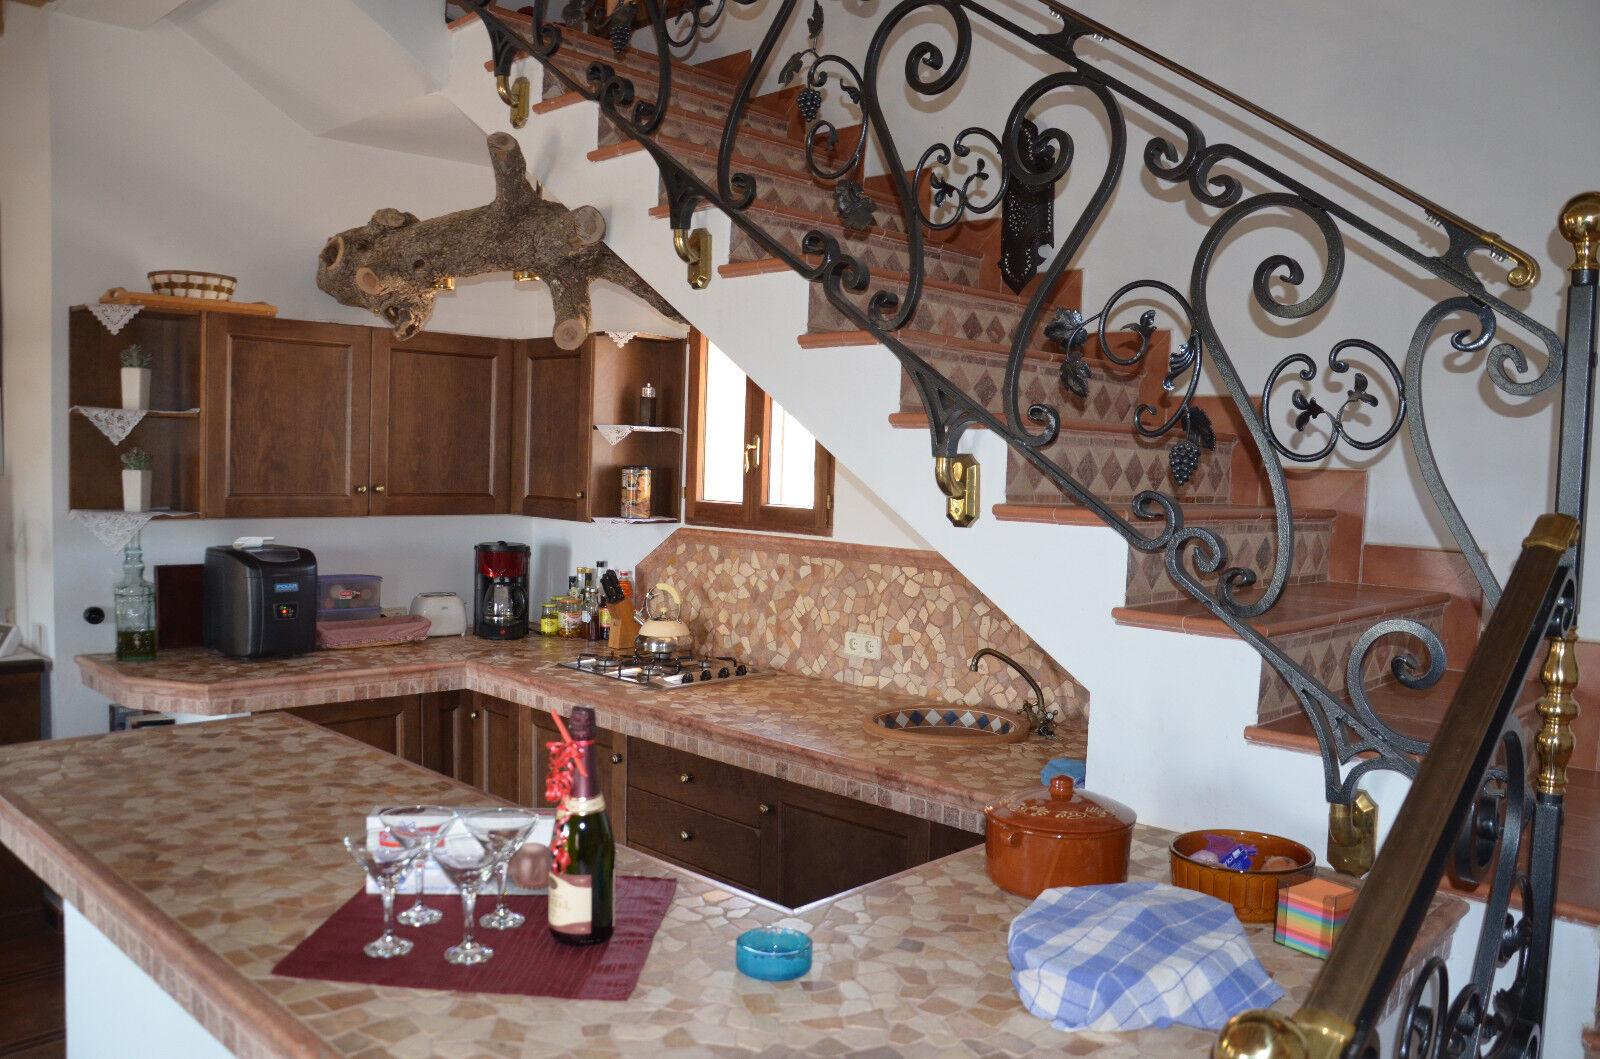 Finca - Cantera Ferienhaus in Sant Llorenc auf Mallorca zu mieten